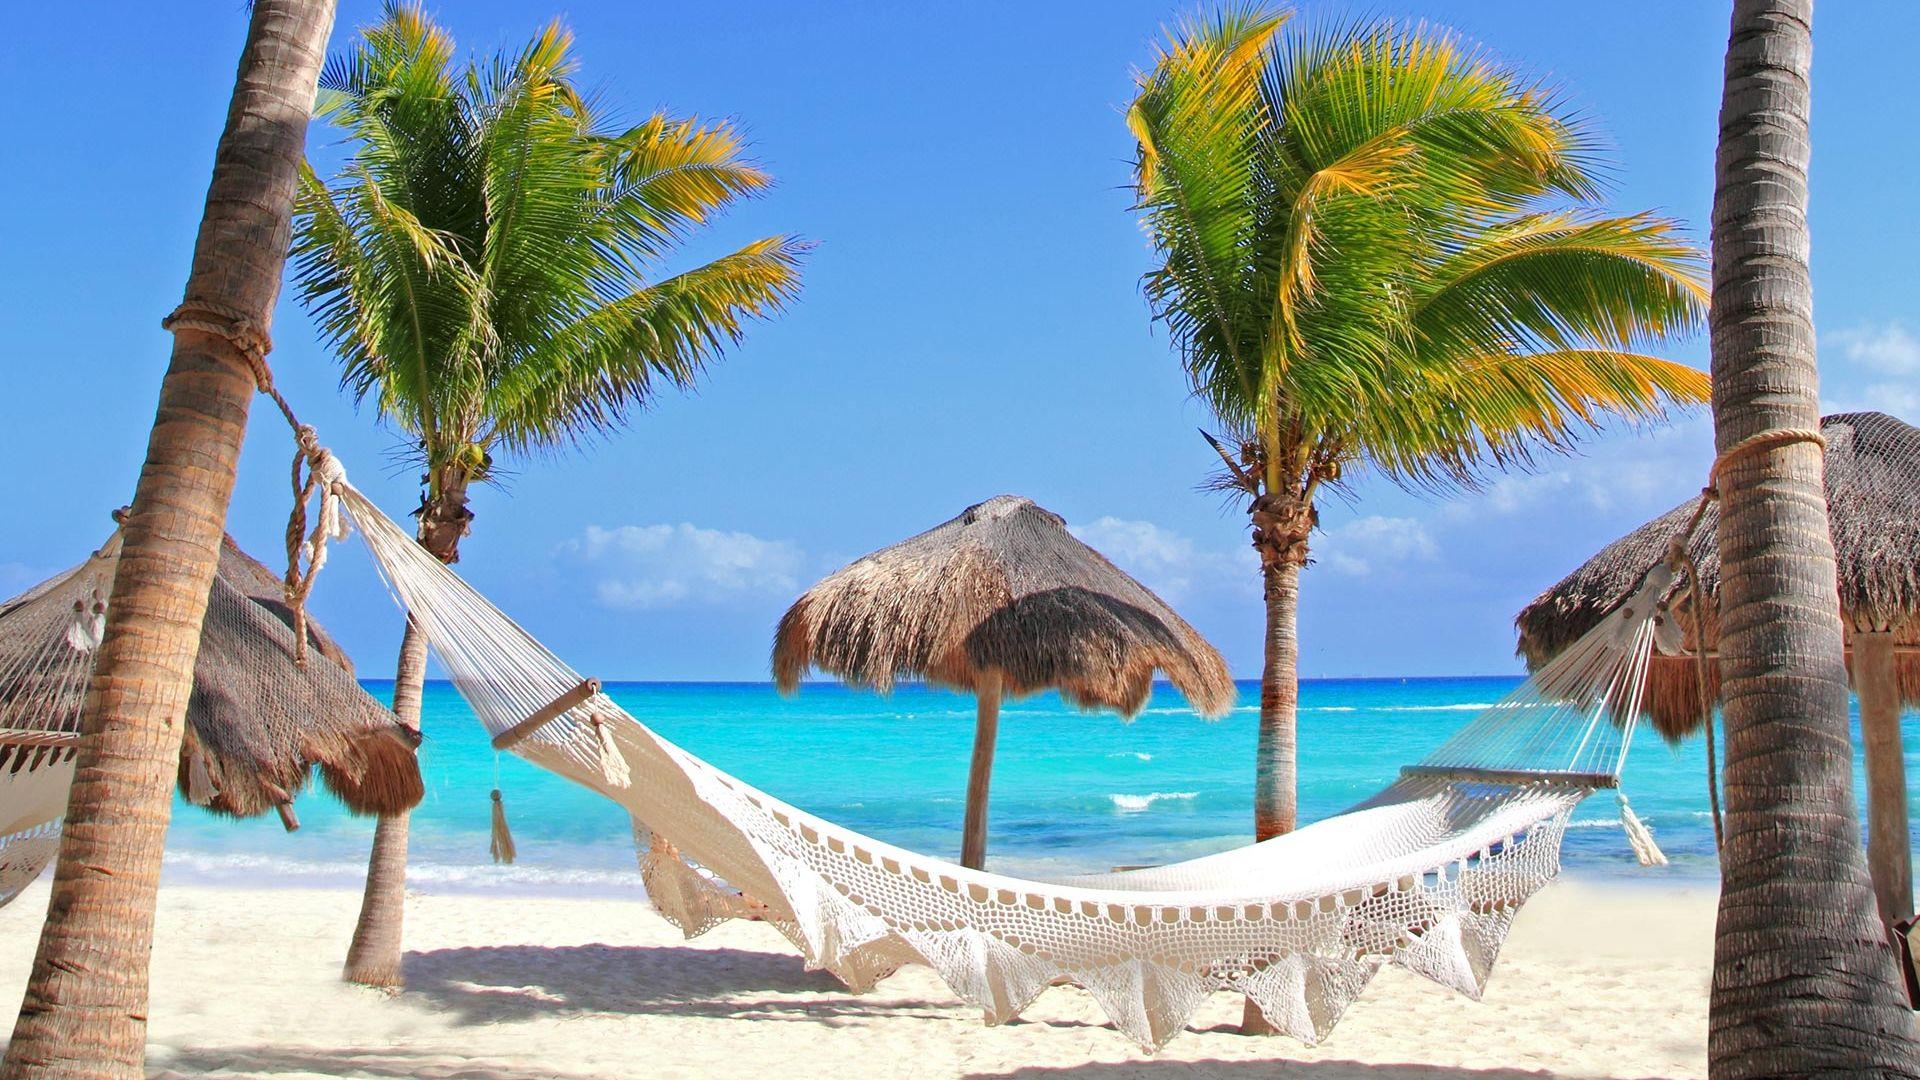 Sejur all inclusive Riviera Maya, Mexic cu Razvan Pascu, 11 zile - 25 octombrie 2021